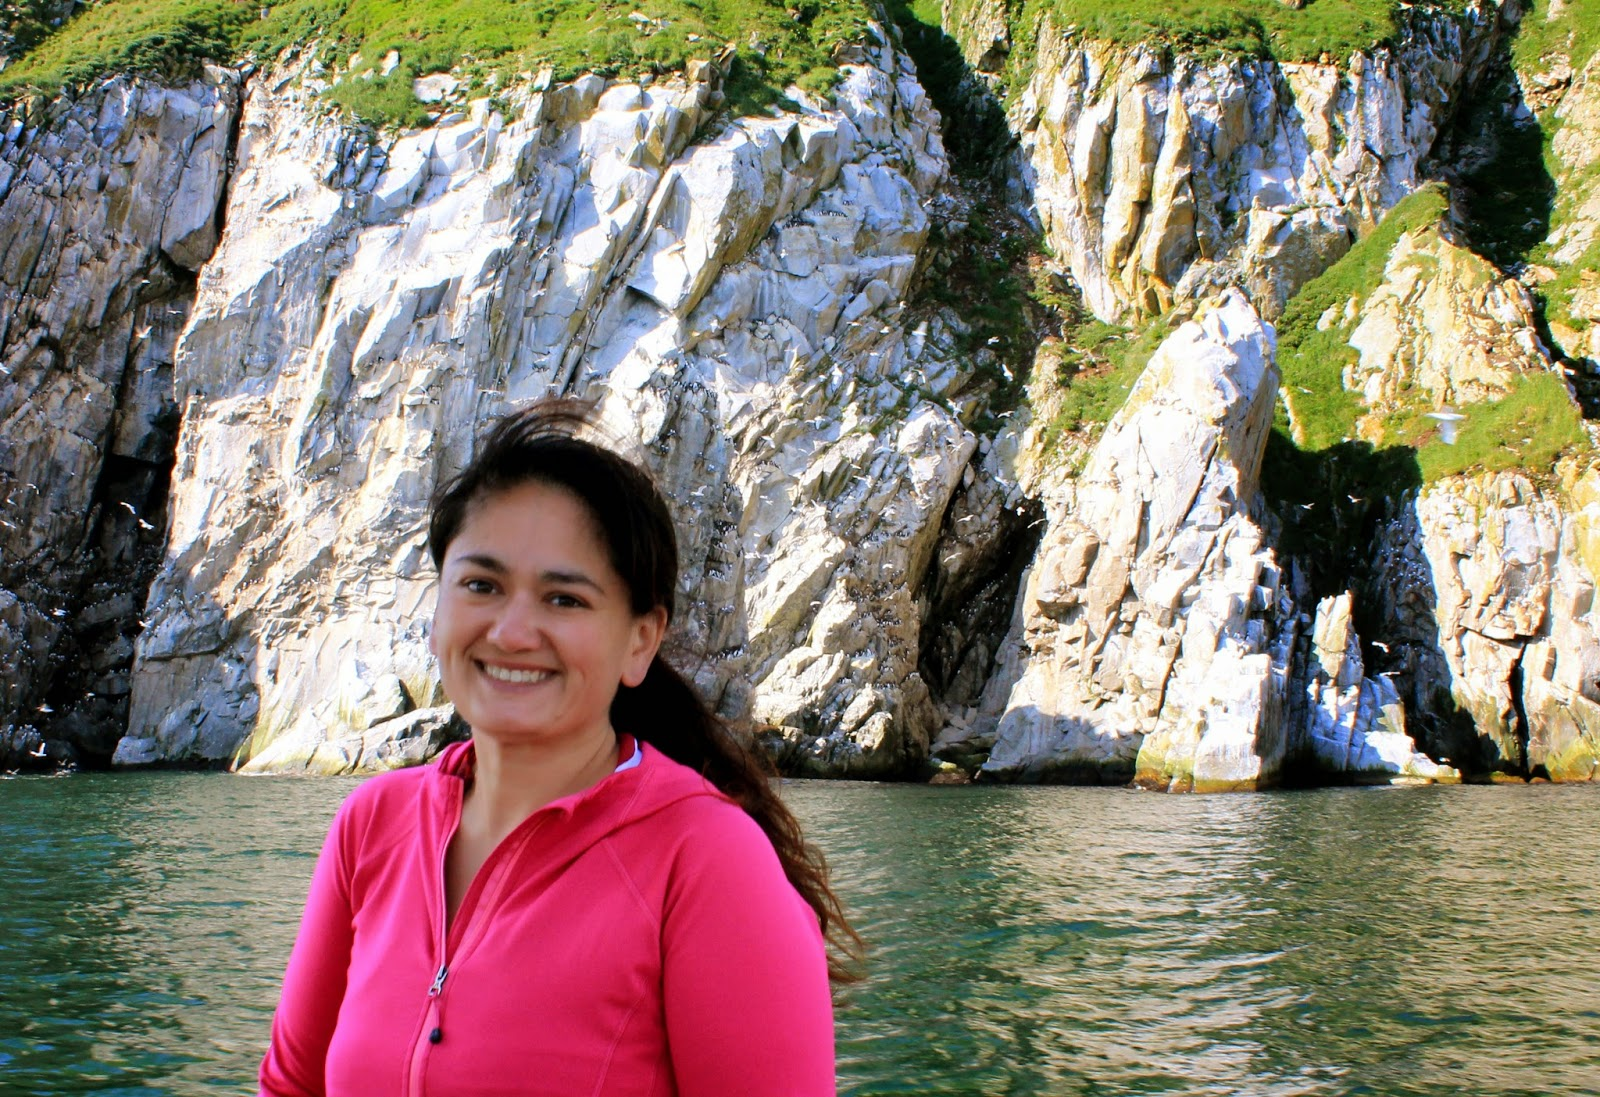 http://nomemade-nomealaska.blogspot.com/2014/08/sledge-island-trip-2.html